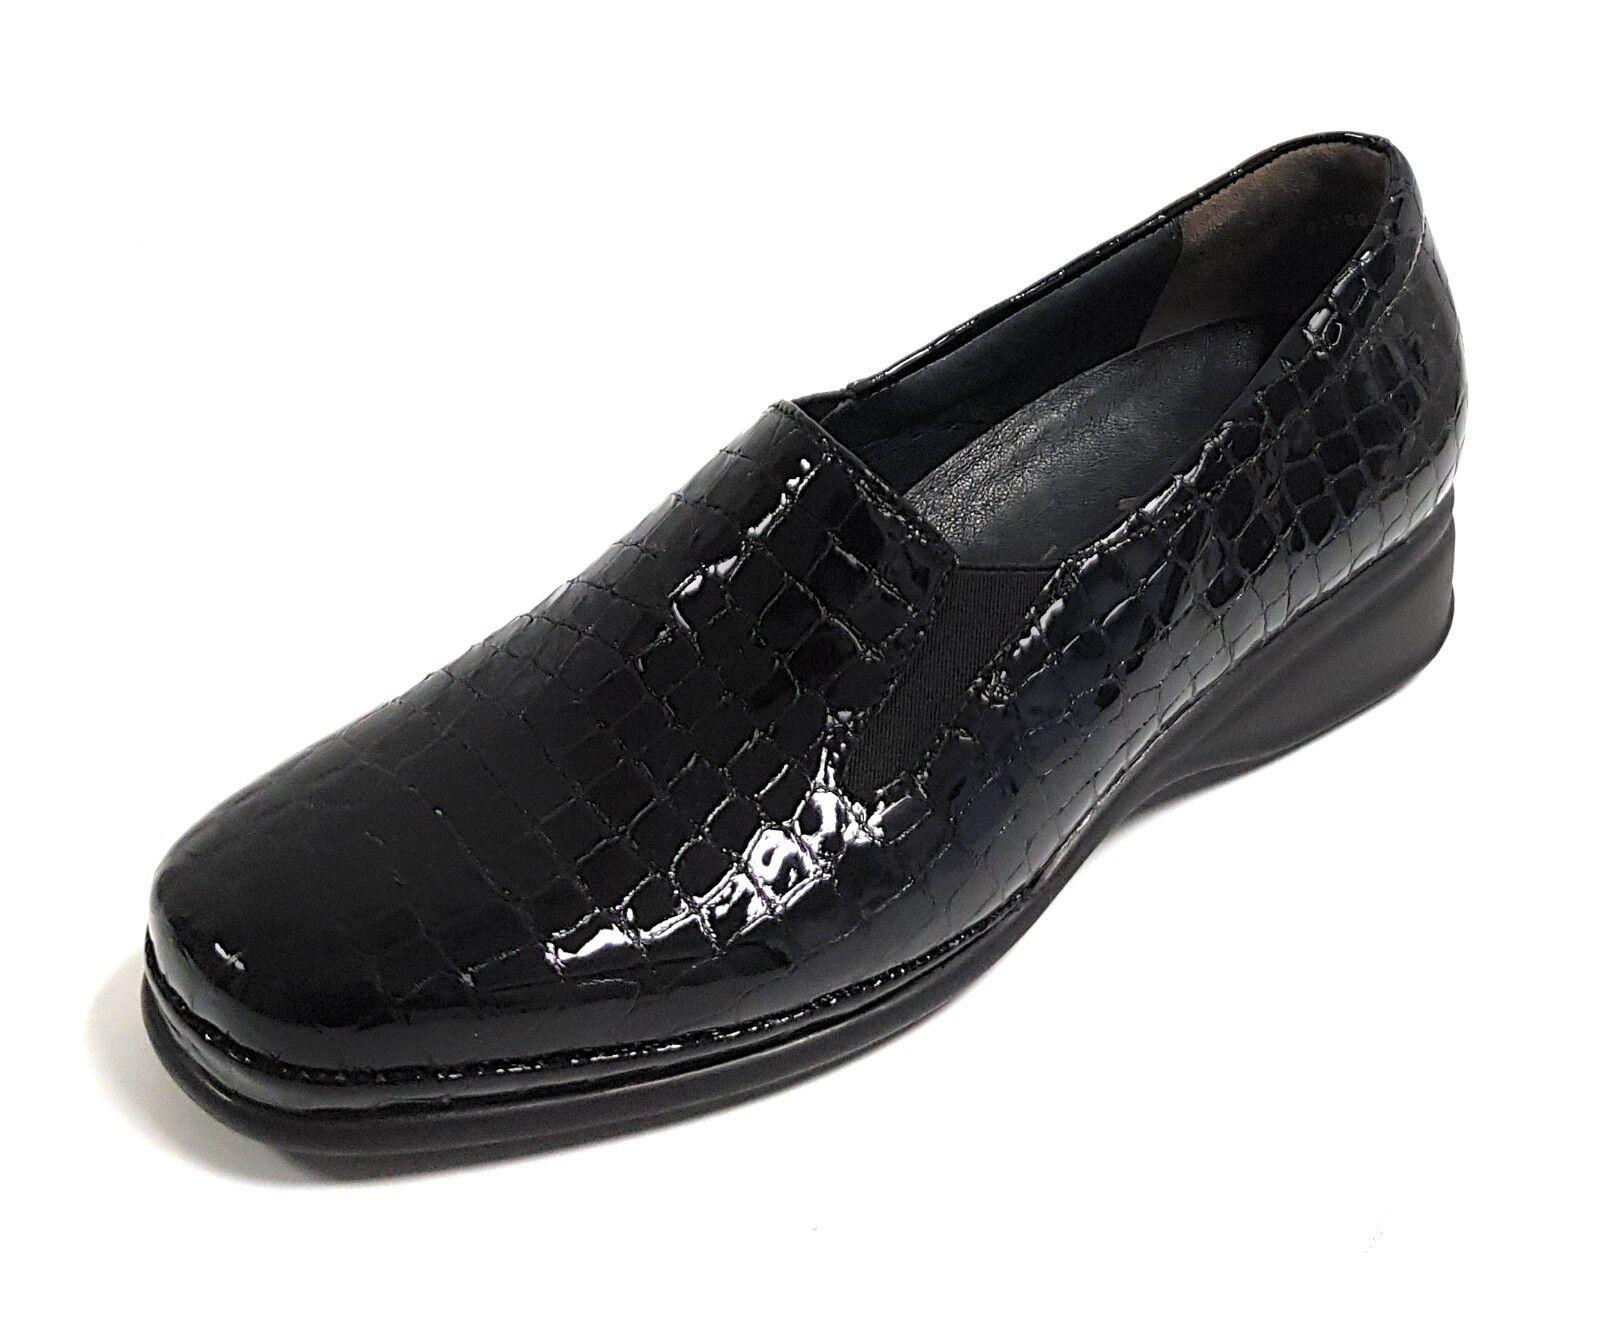 Semler Marina Damen Schuhe Damens Schuhes Slipper Mokassins PU-Luftpolstersohle NEU